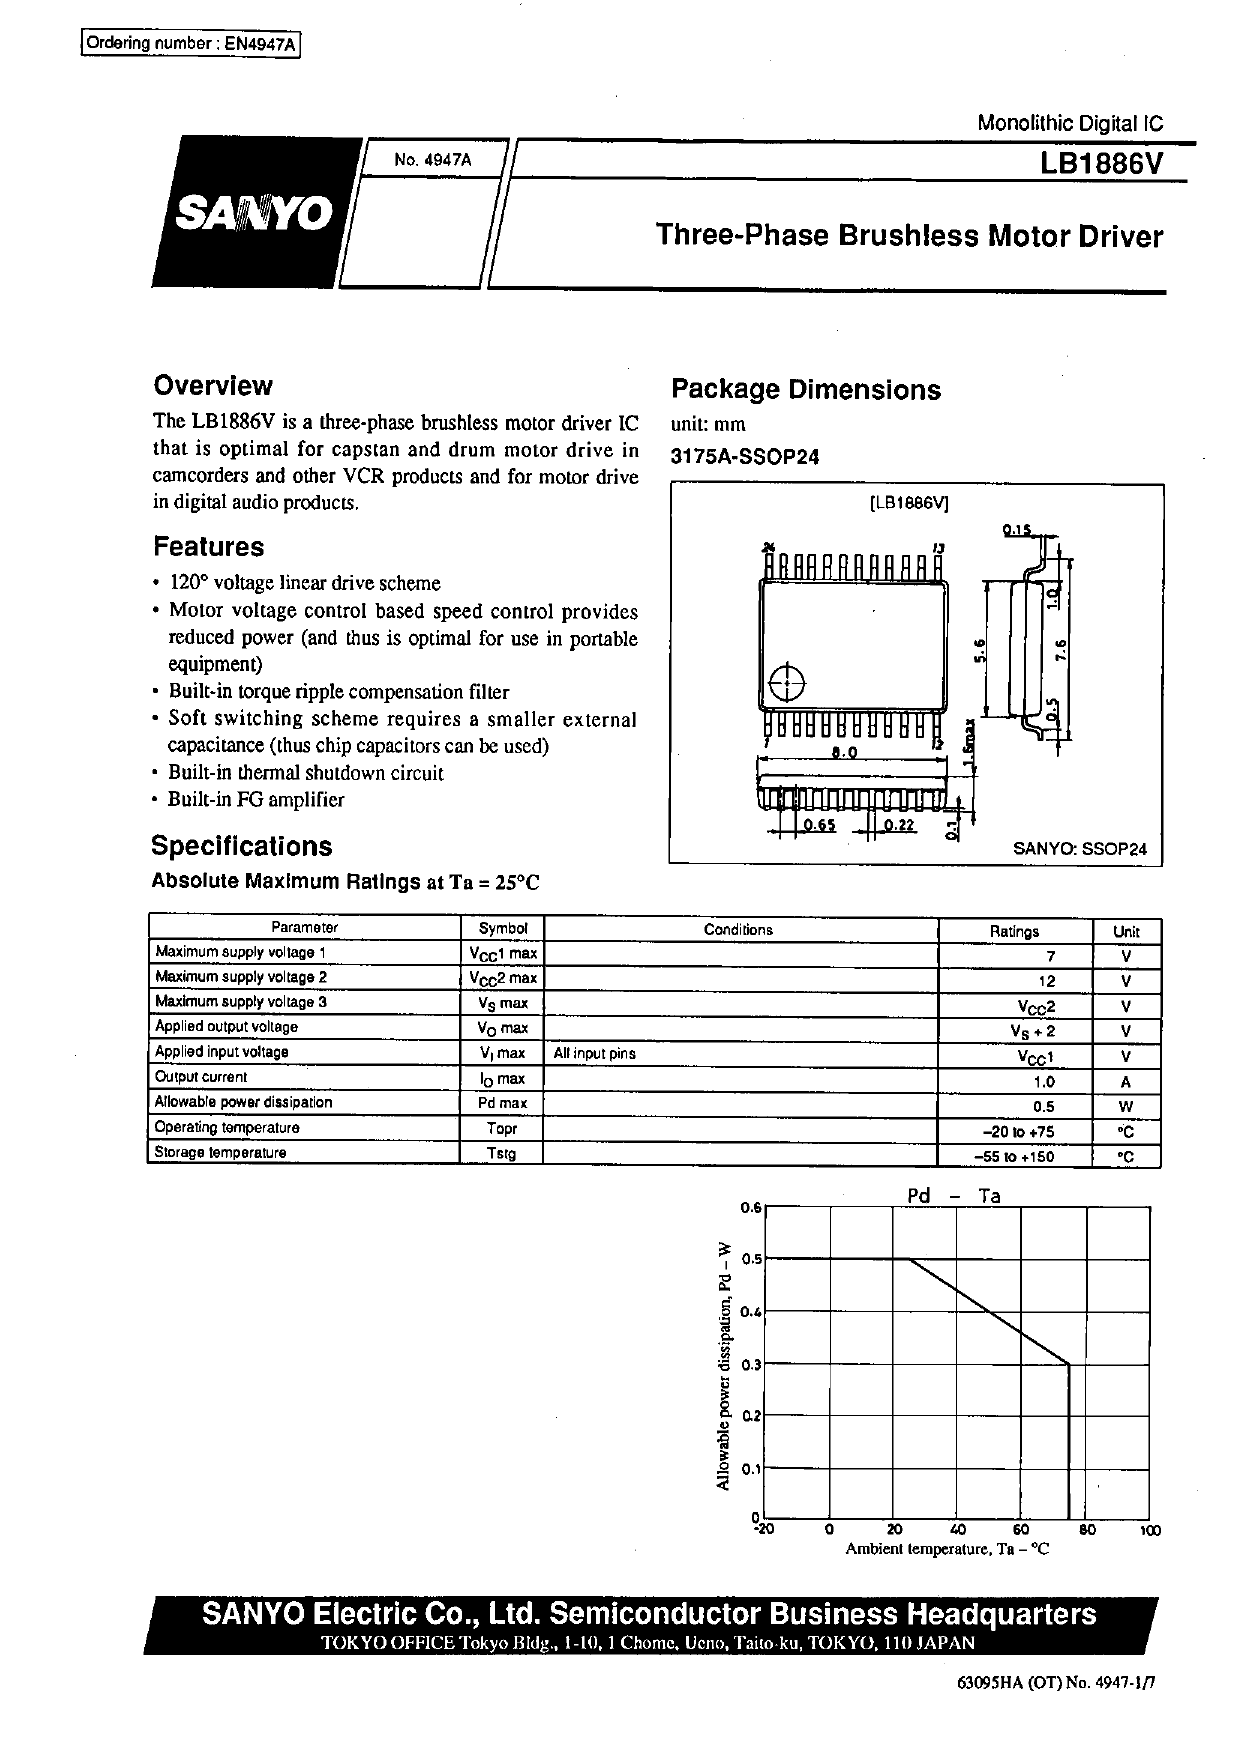 LB1886V datasheet